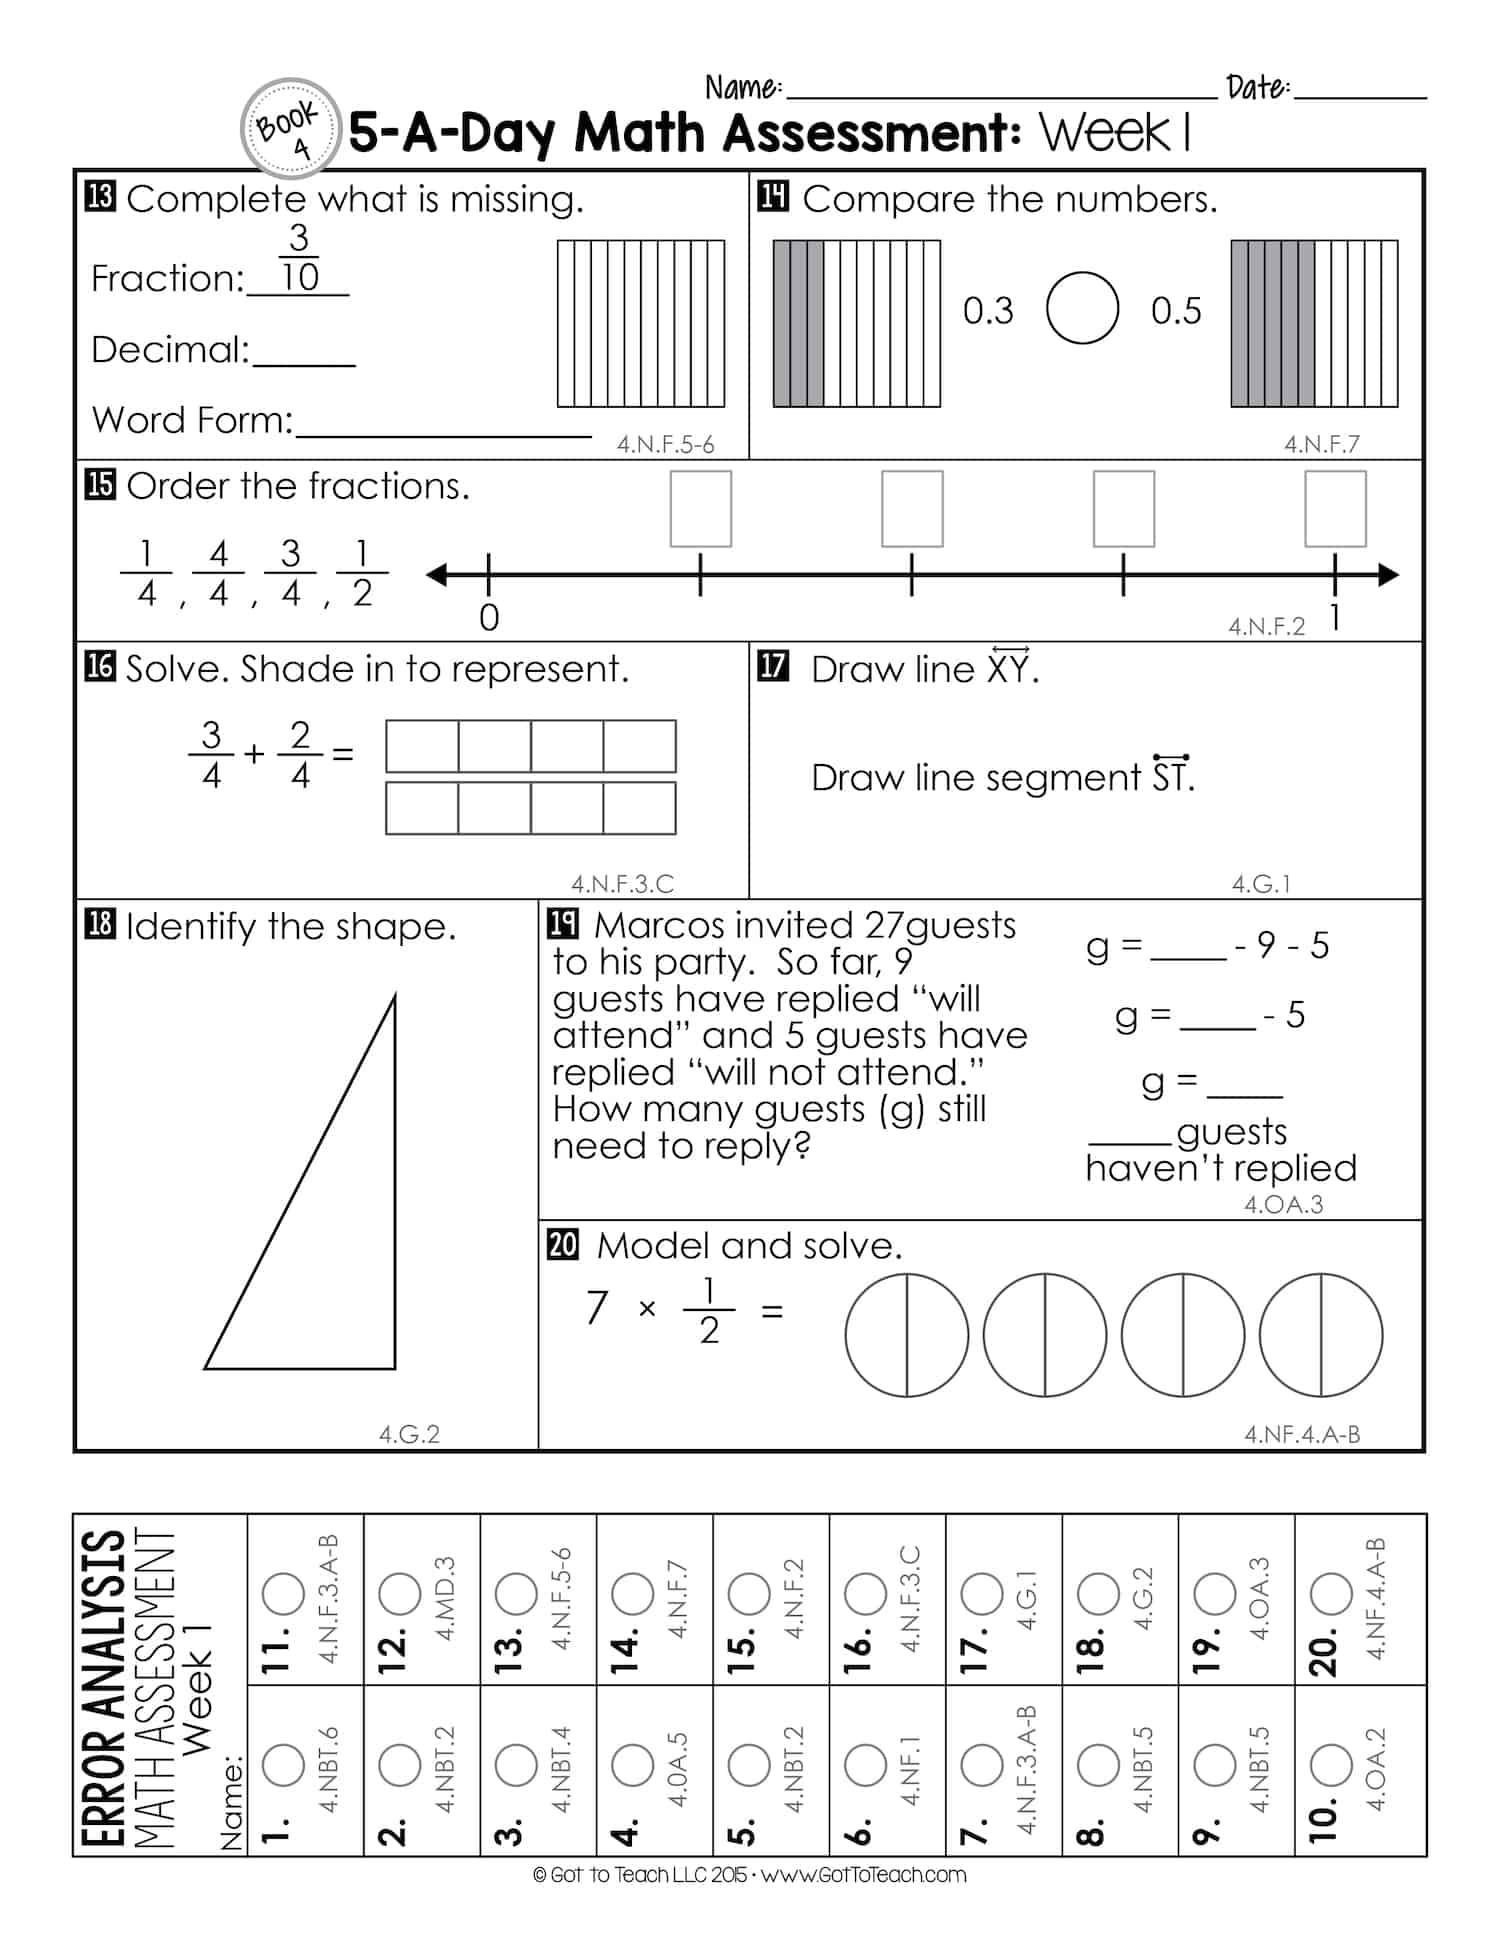 4th grade weekly math assessments teacher thrive. Black Bedroom Furniture Sets. Home Design Ideas